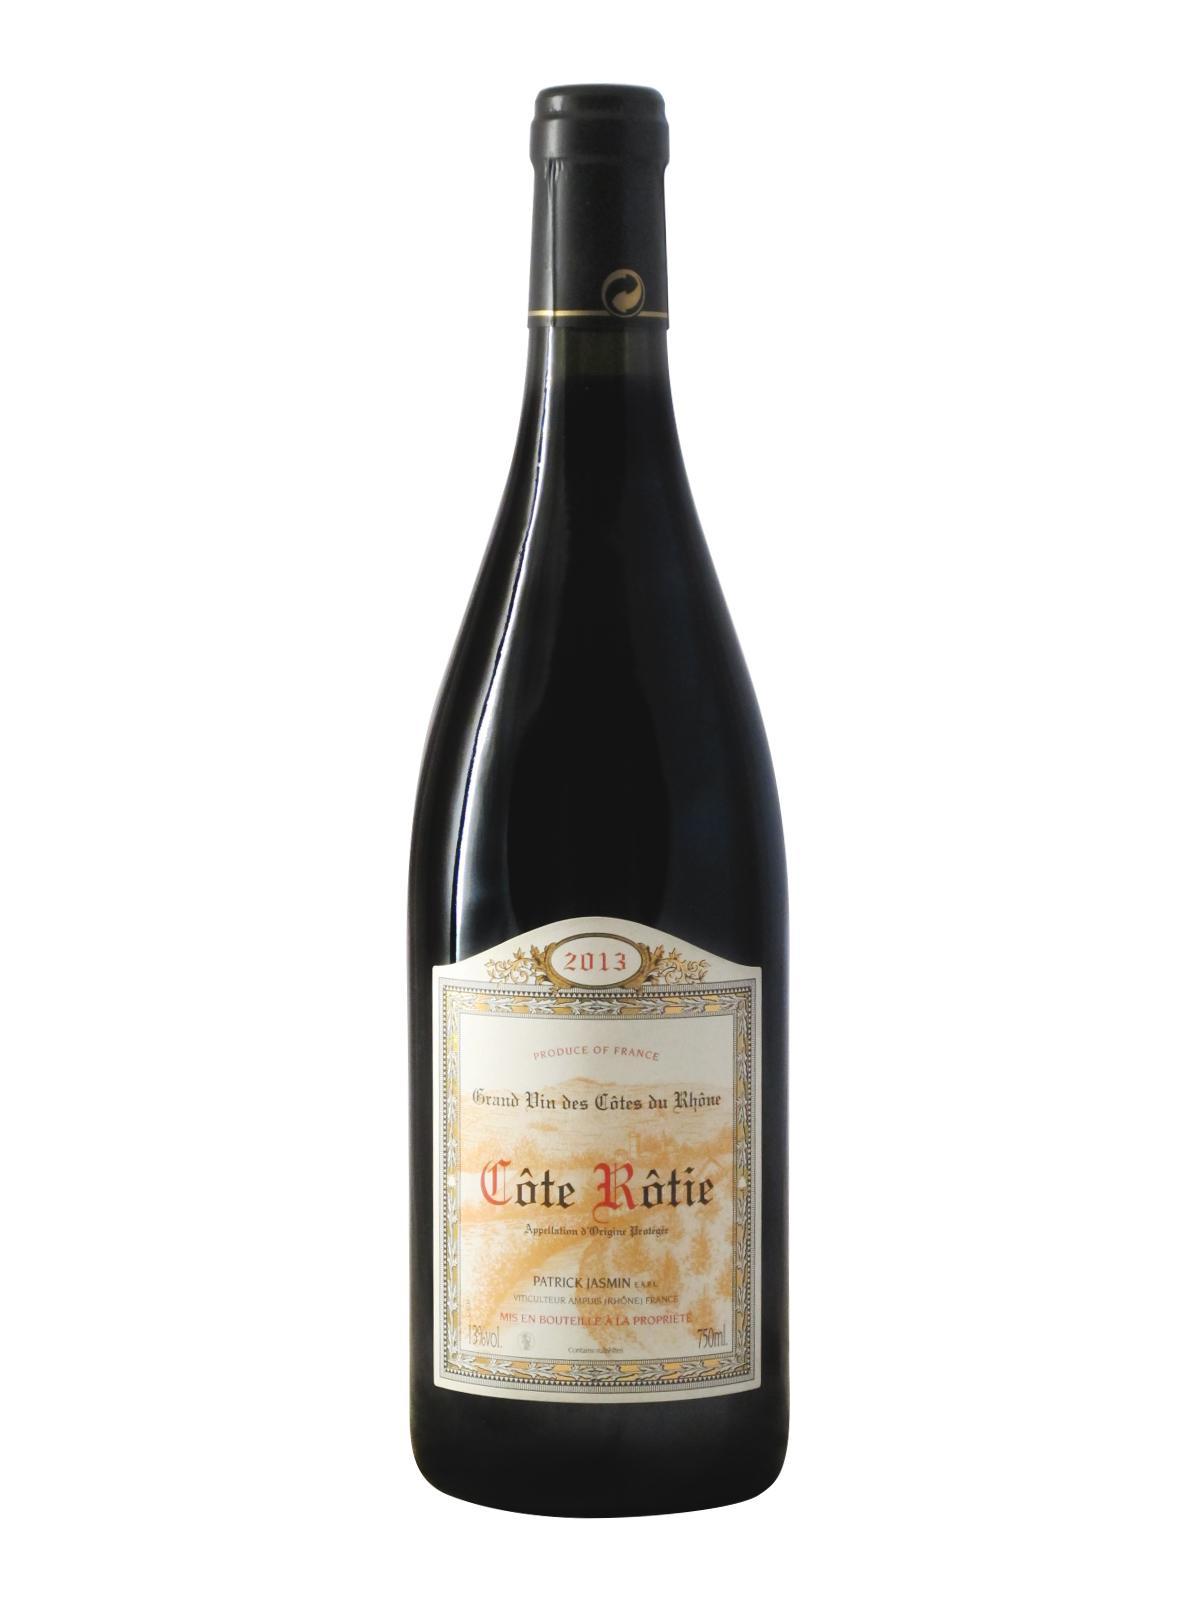 Vino rosso Côte Rôtie Olea